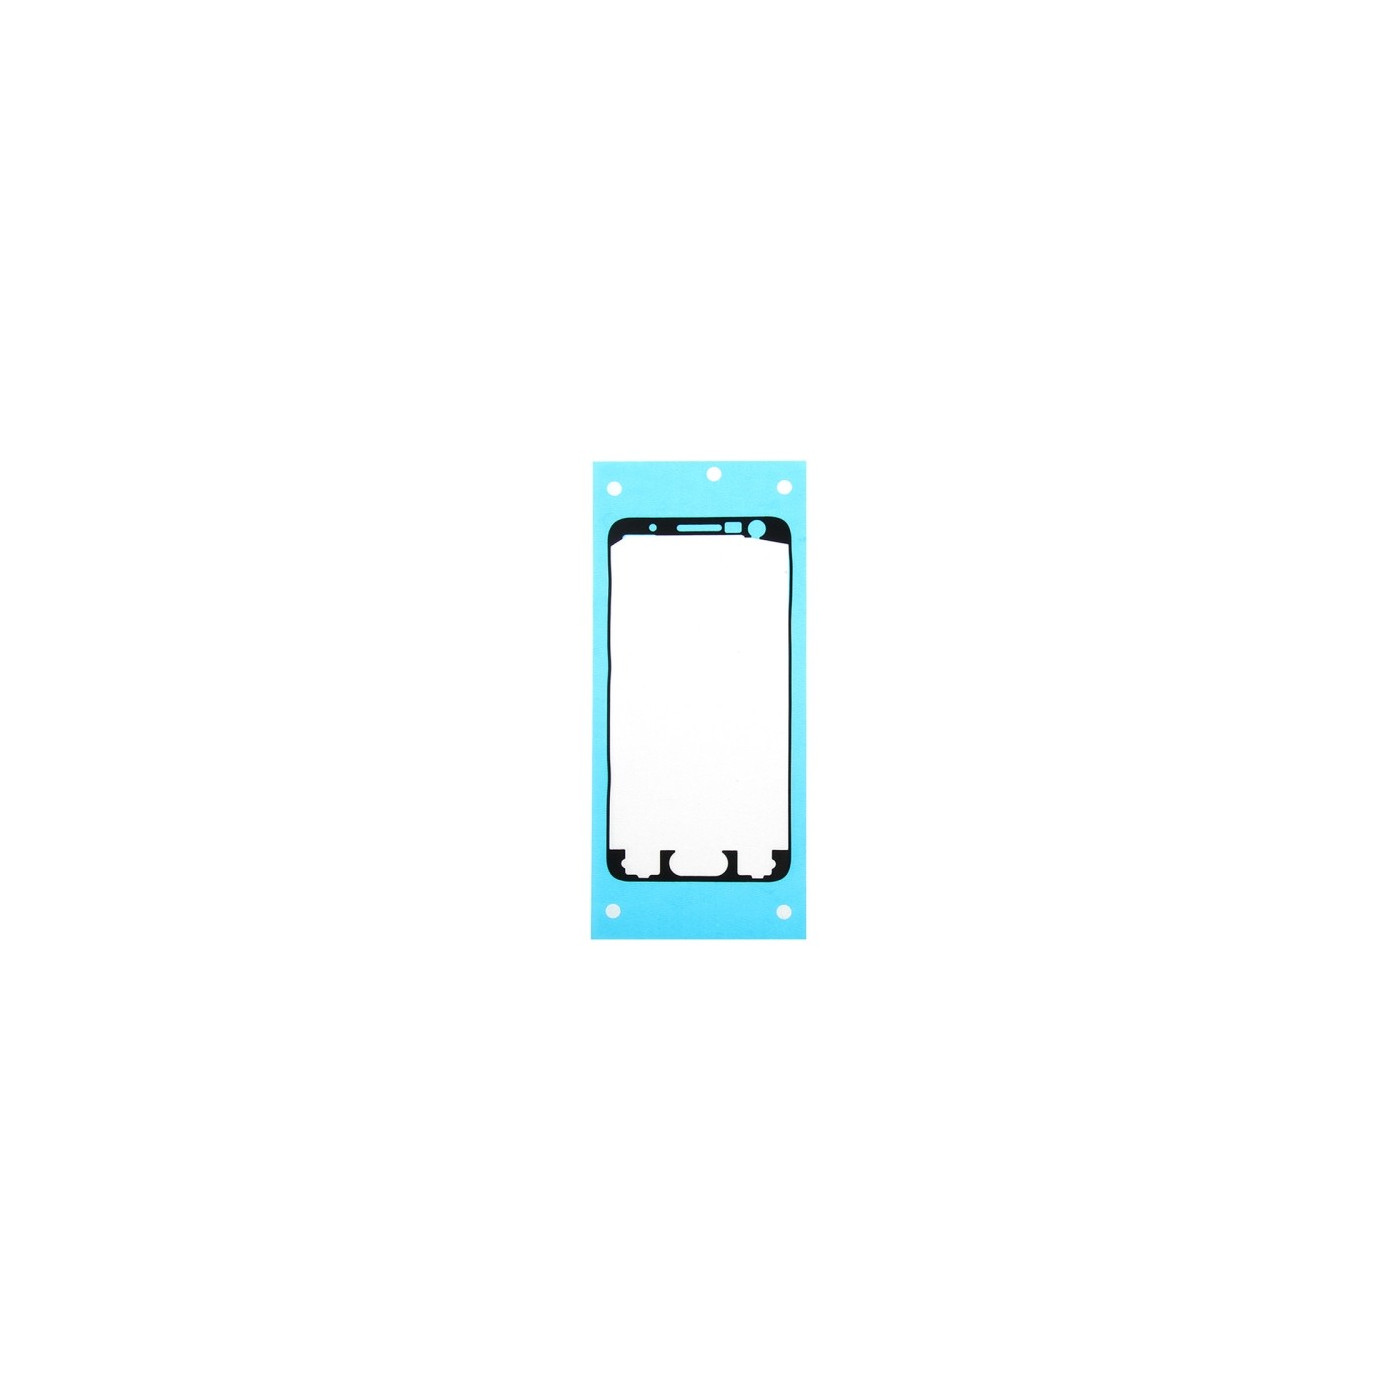 Adhésif double face en verre pour écran tactile Samsung Galaxy A3 / A300